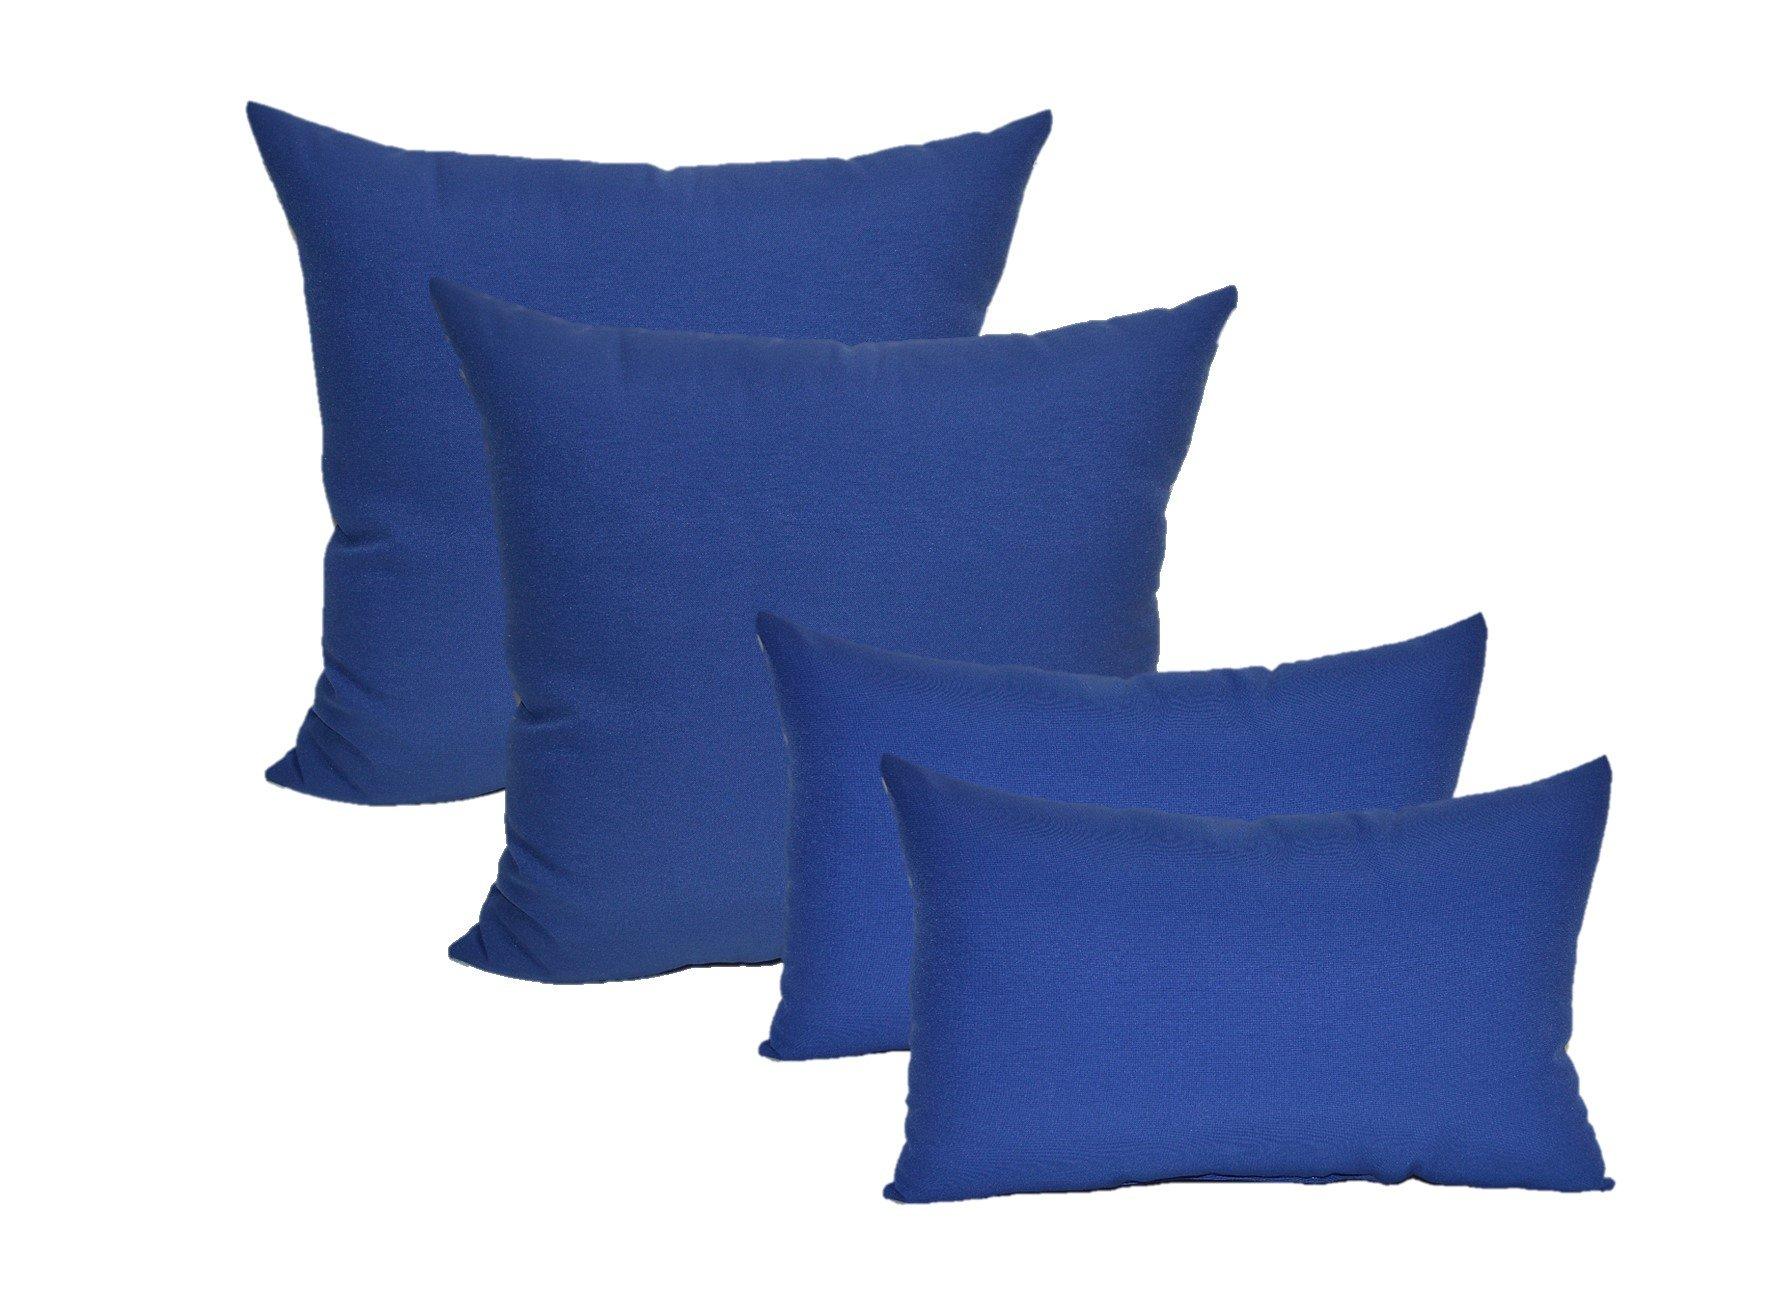 Set of 4 Indoor / Outdoor Pillows - 17'' Square Throw Pillows & 11'' x 19'' Rectangle / Lumbar Decorative Throw Pillows - Solid Royal / Admiral Blue Fabric